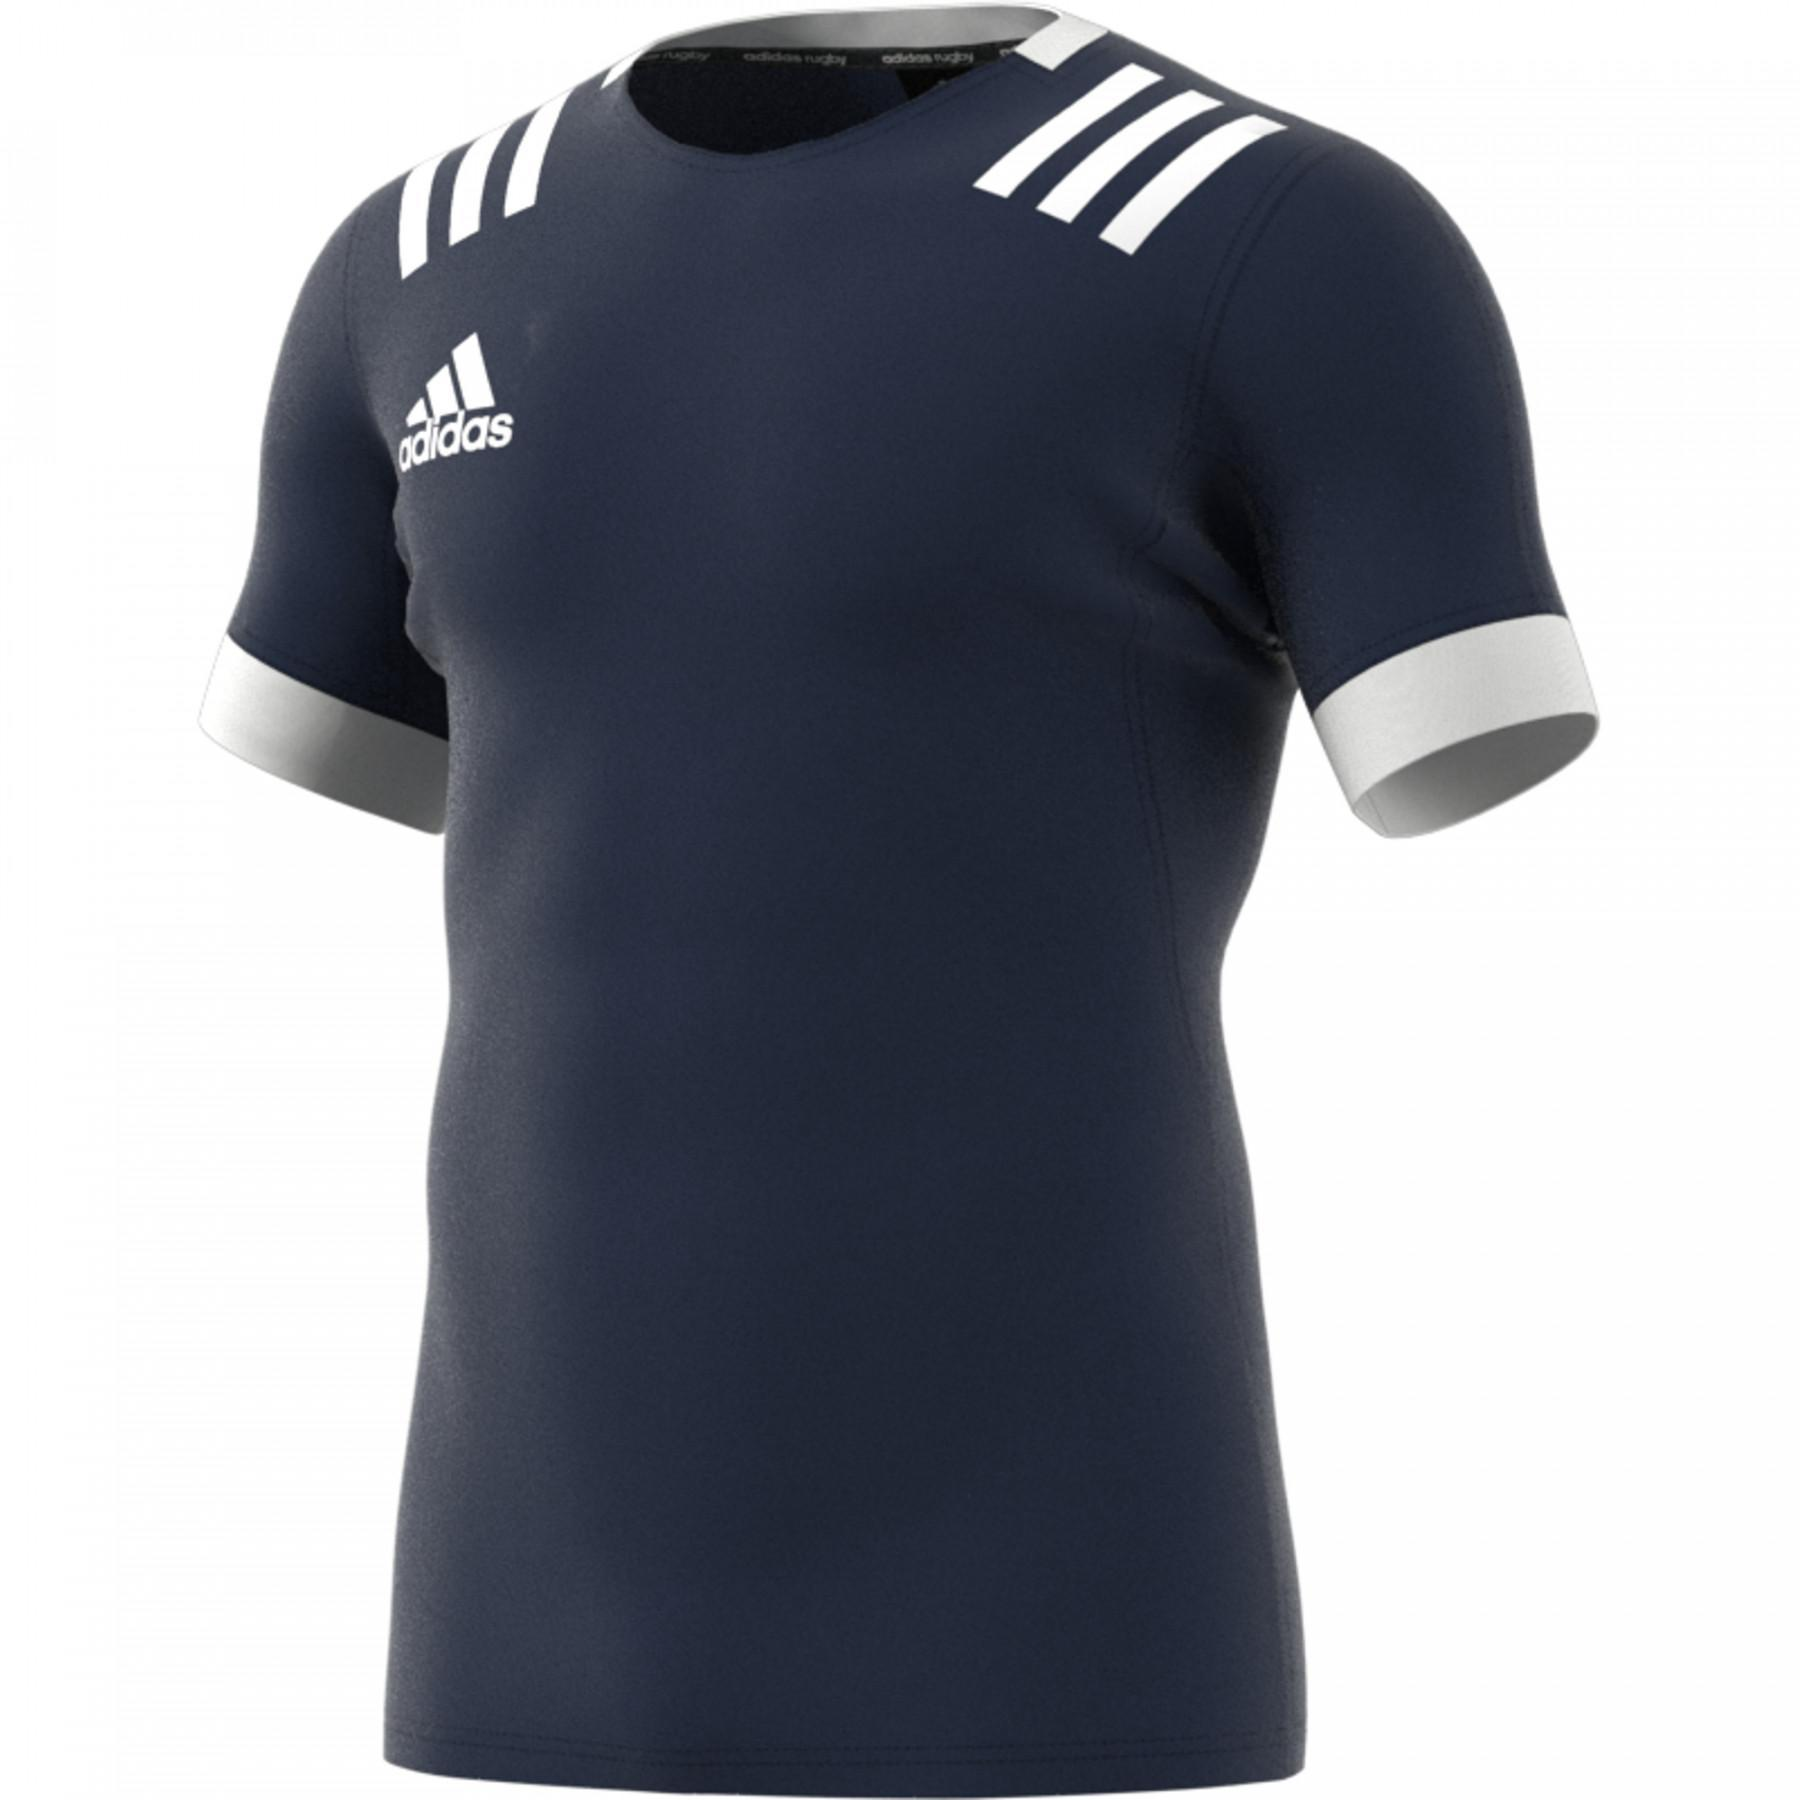 Training Jersey adidas 3-Stripes